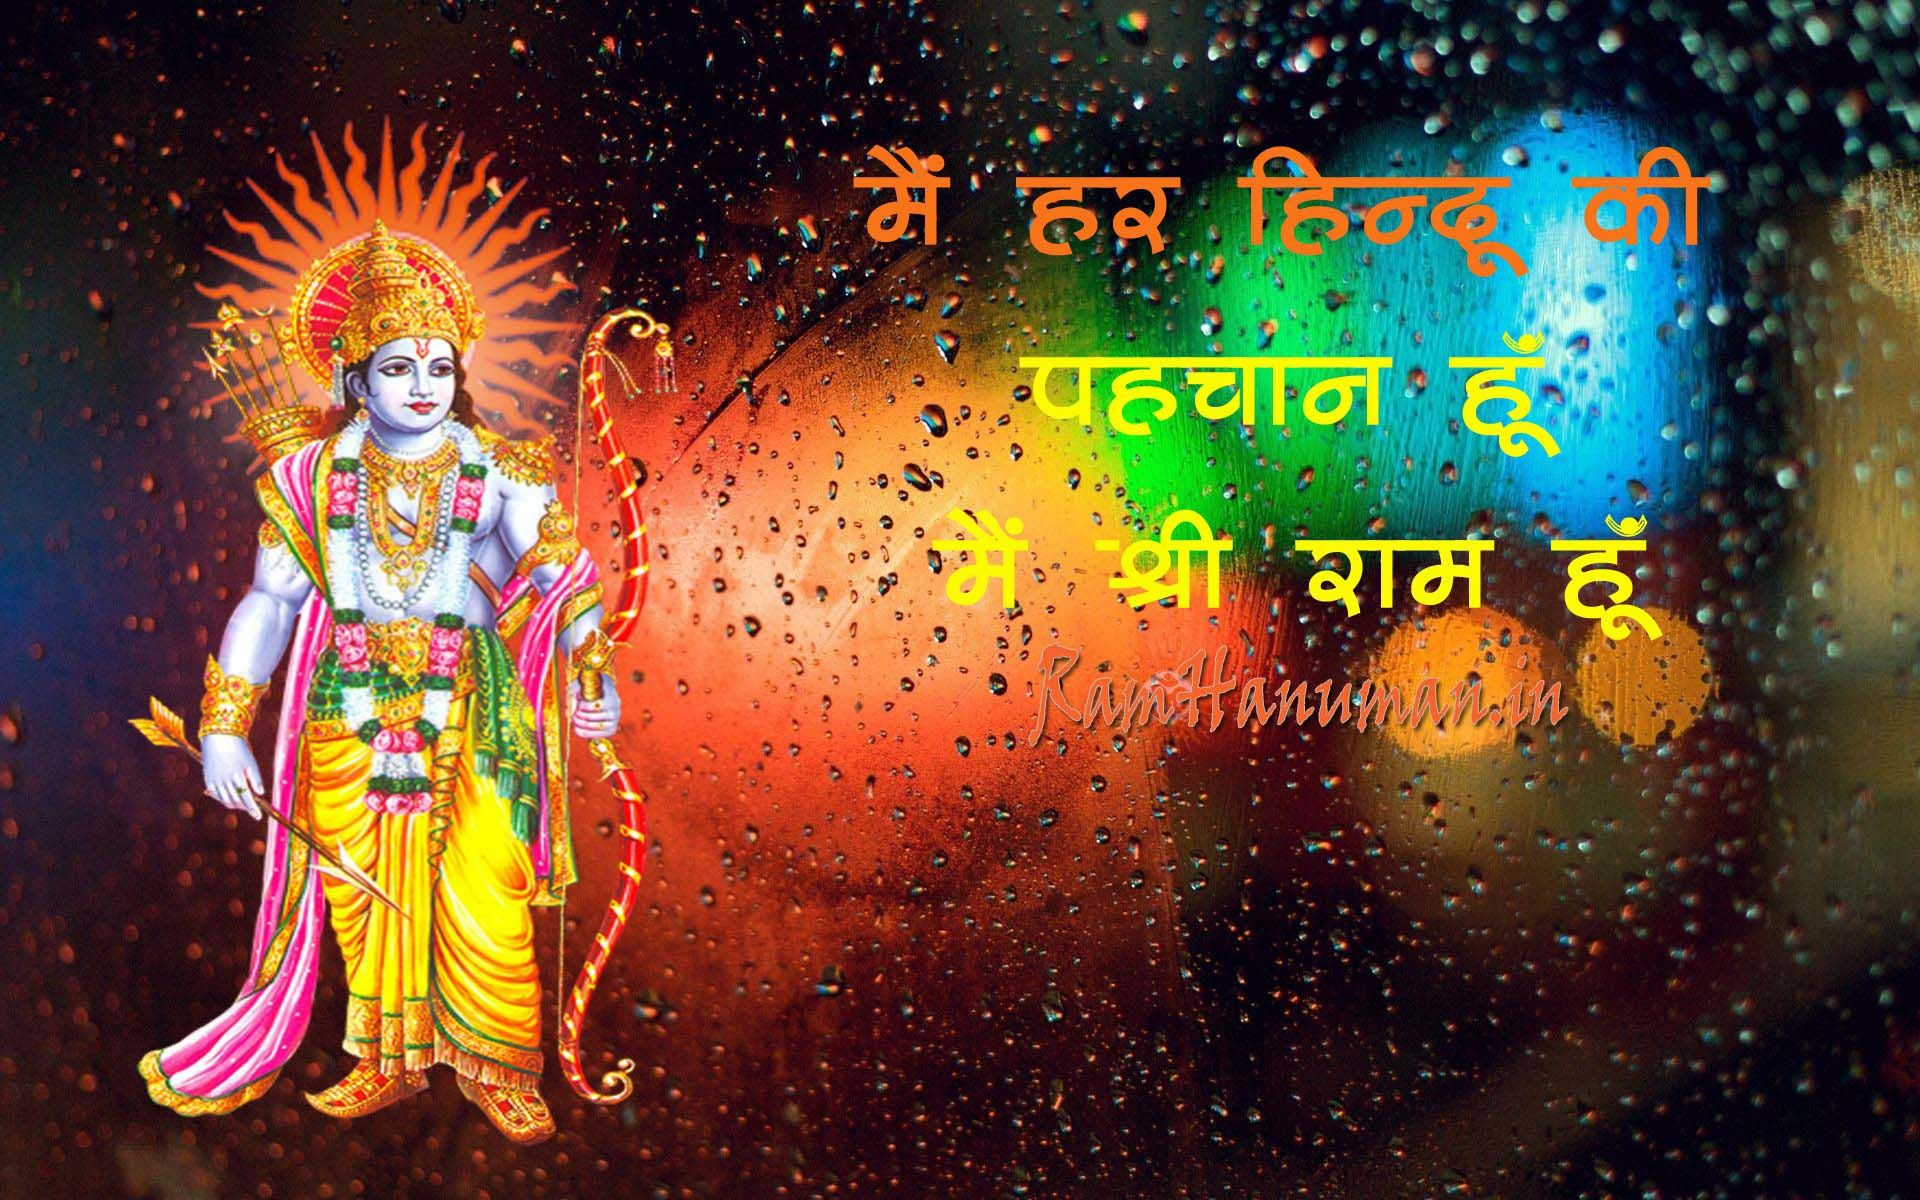 Hd wallpaper ram - Ram Sita Painting Hd Wallpapers Download God Wallpaper Photos 1024 768 Ram Wallpapers 48